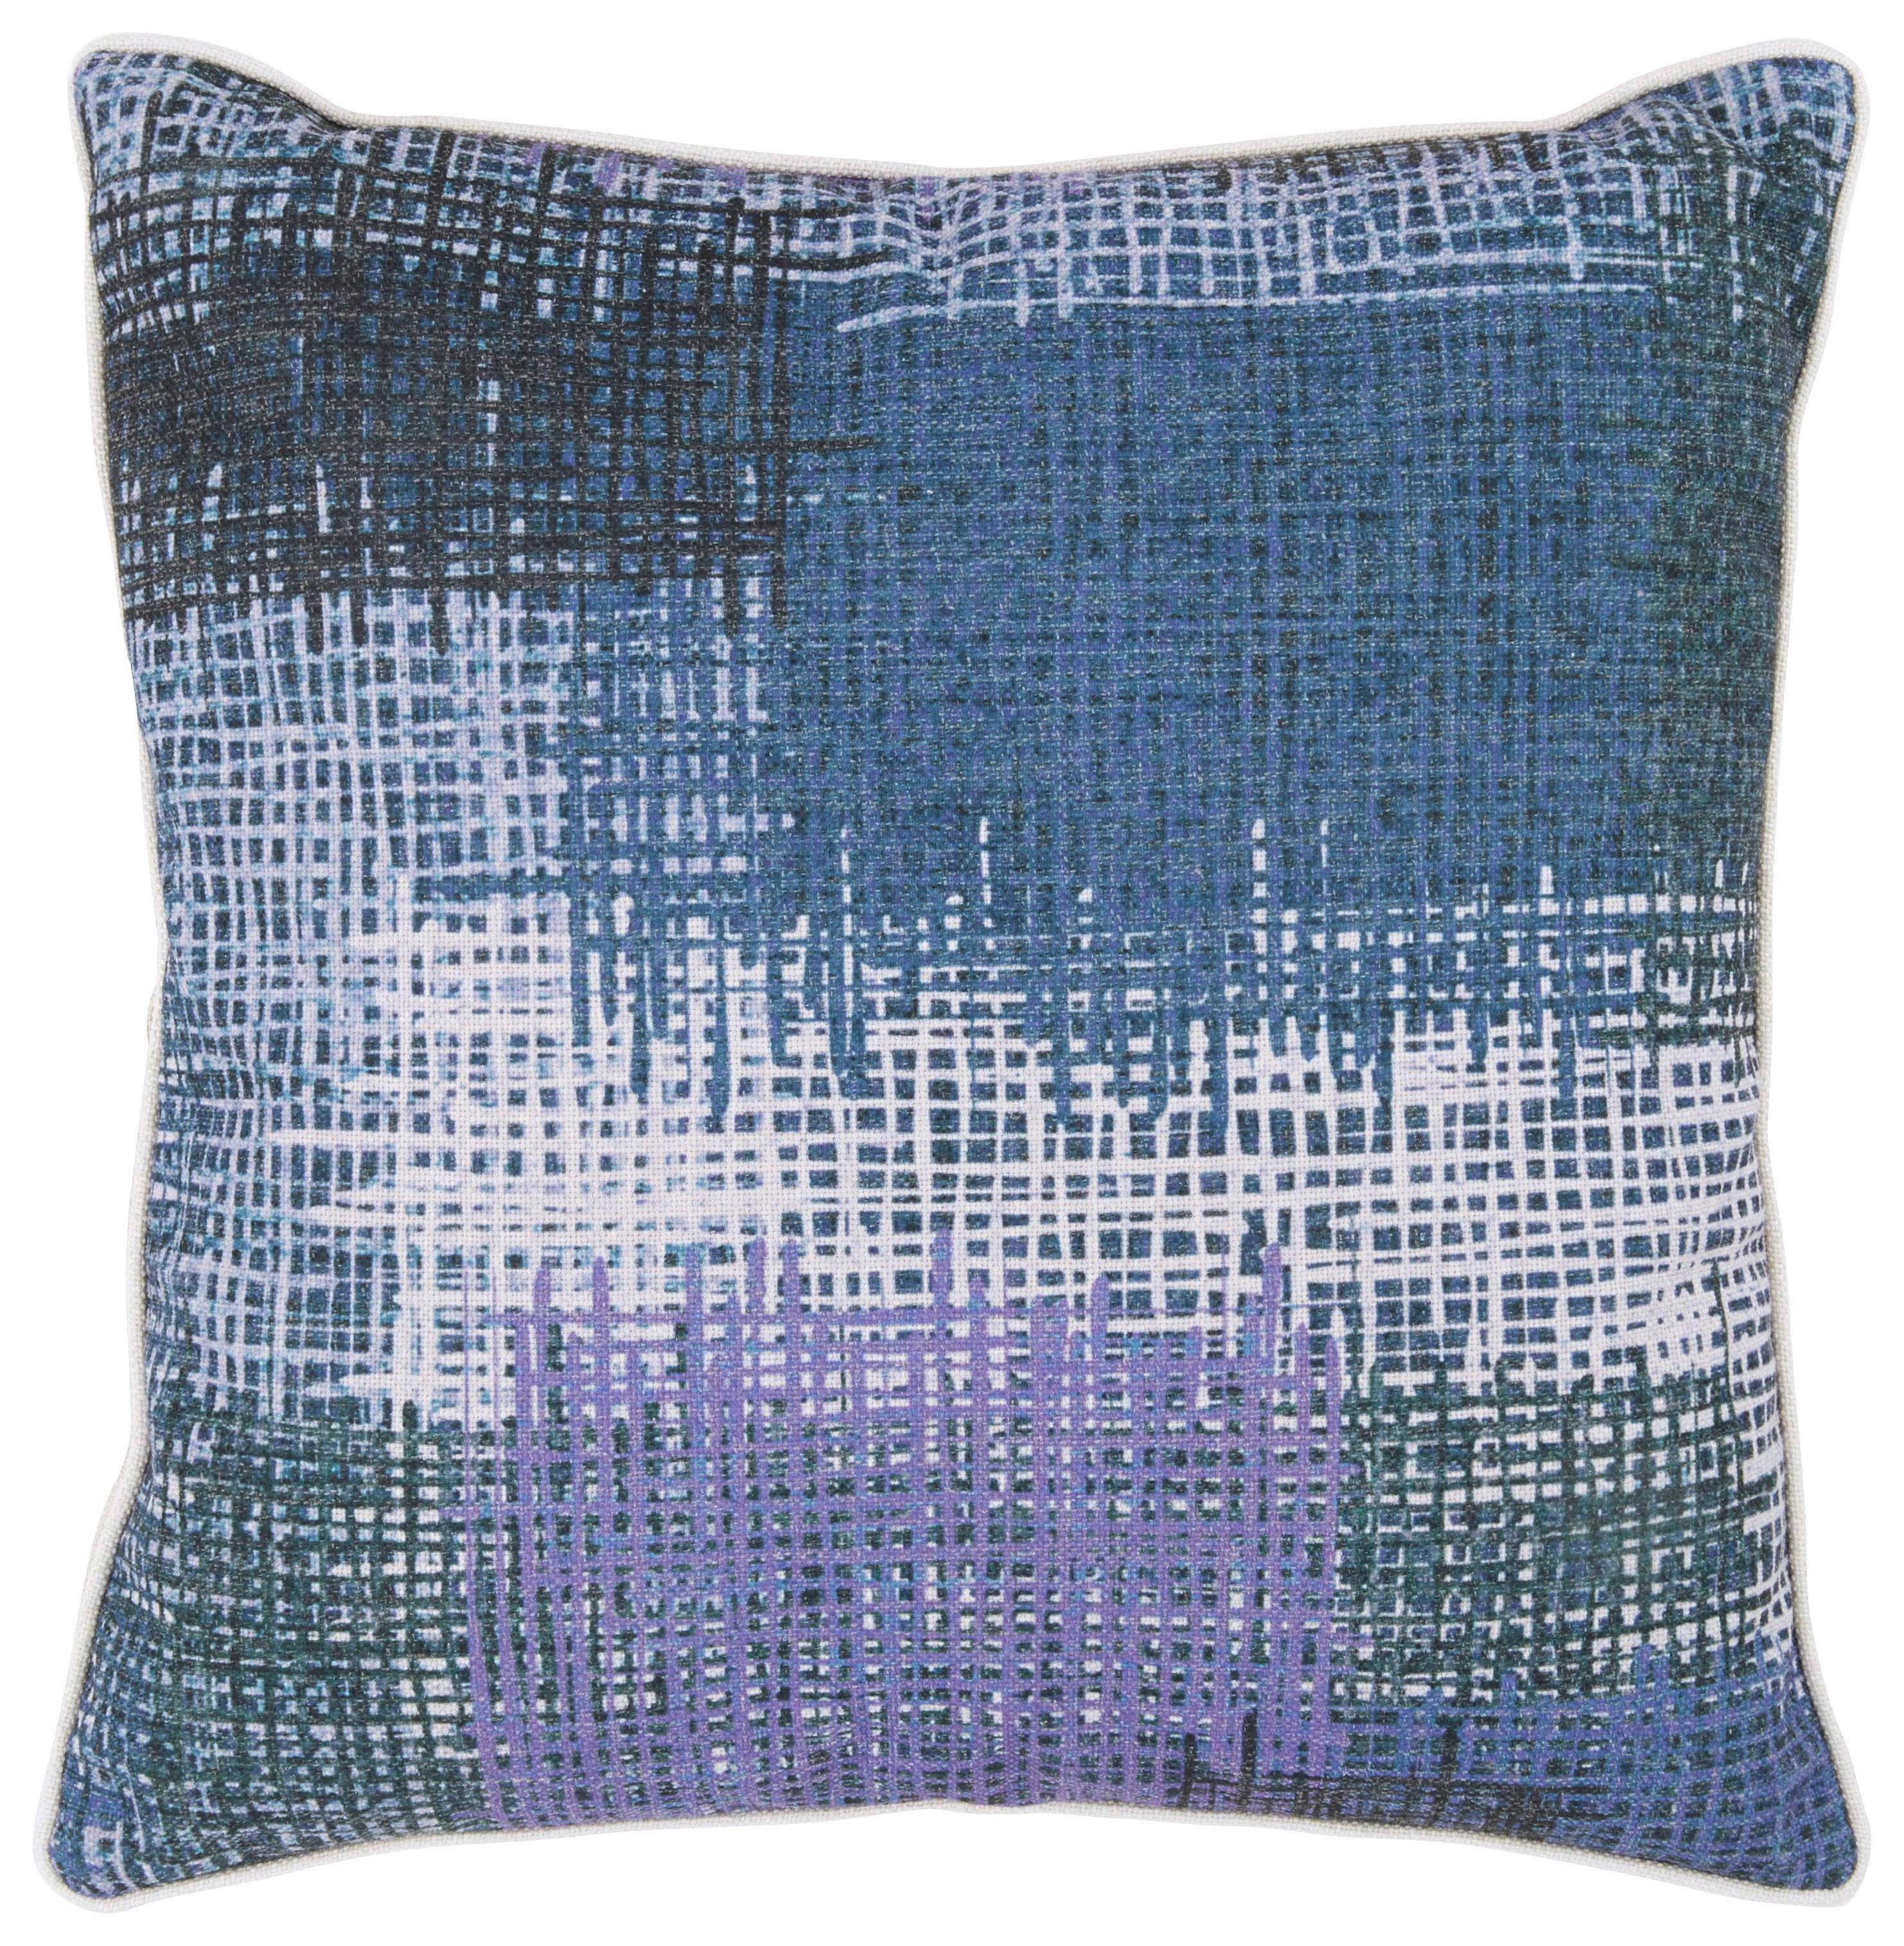 Zierkissen Marble, ca. 45x45cm - Lila/Grau, LIFESTYLE, Textil (45/45cm) - MÖMAX modern living